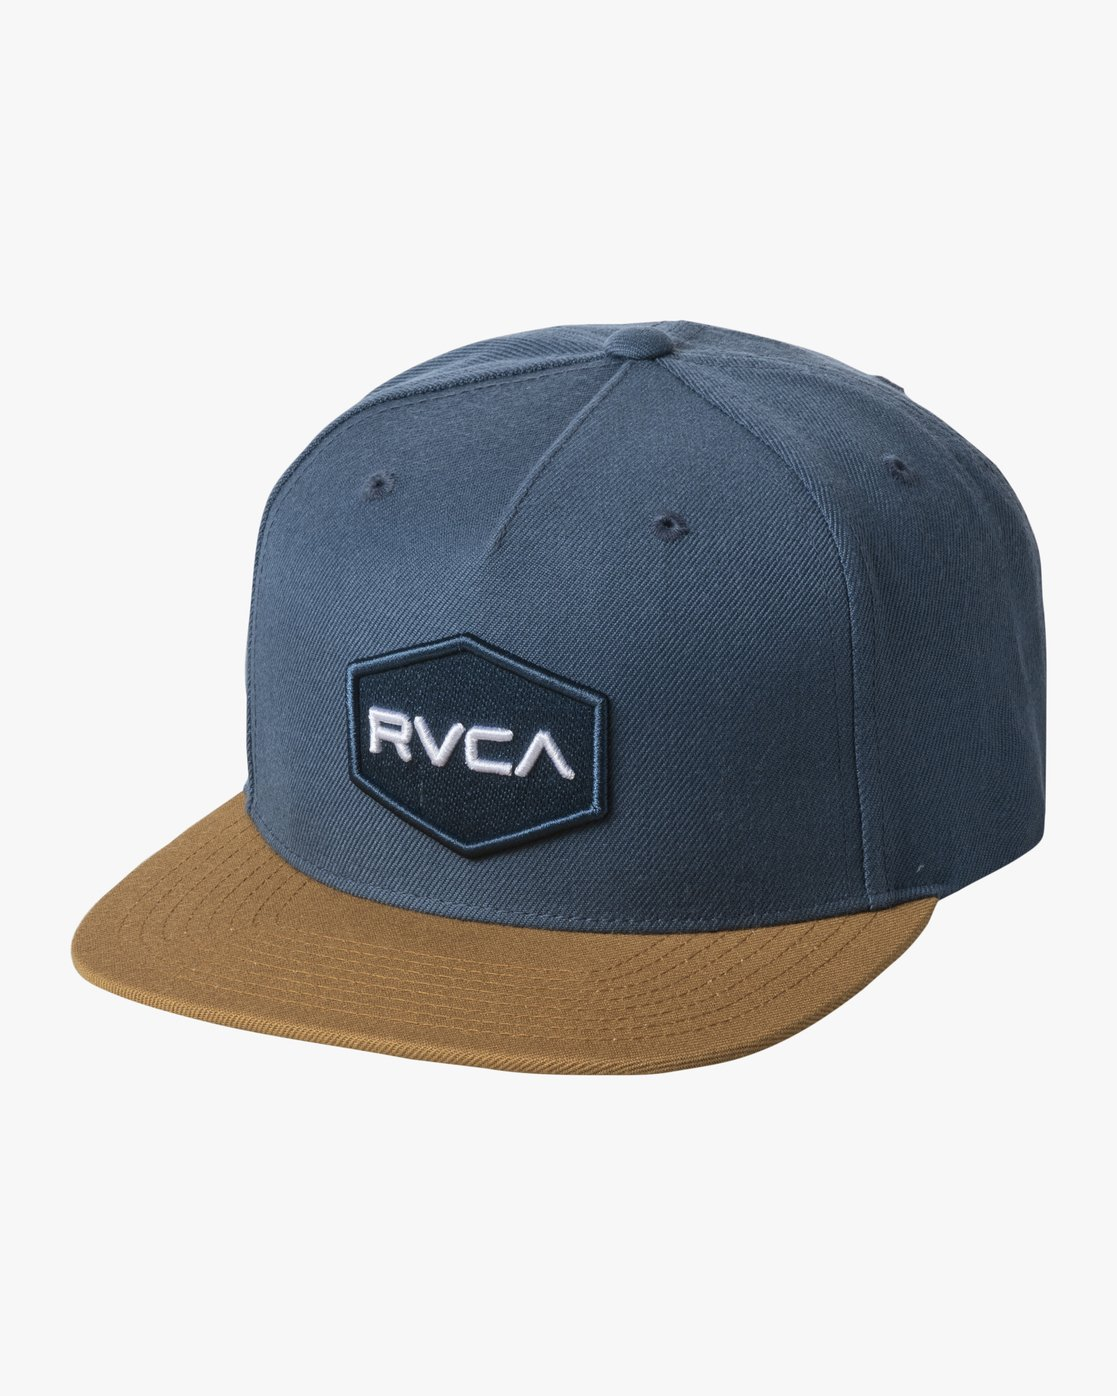 0 COMMONWEALTH SNAPBACK HAT Grey MDAHWCWS RVCA